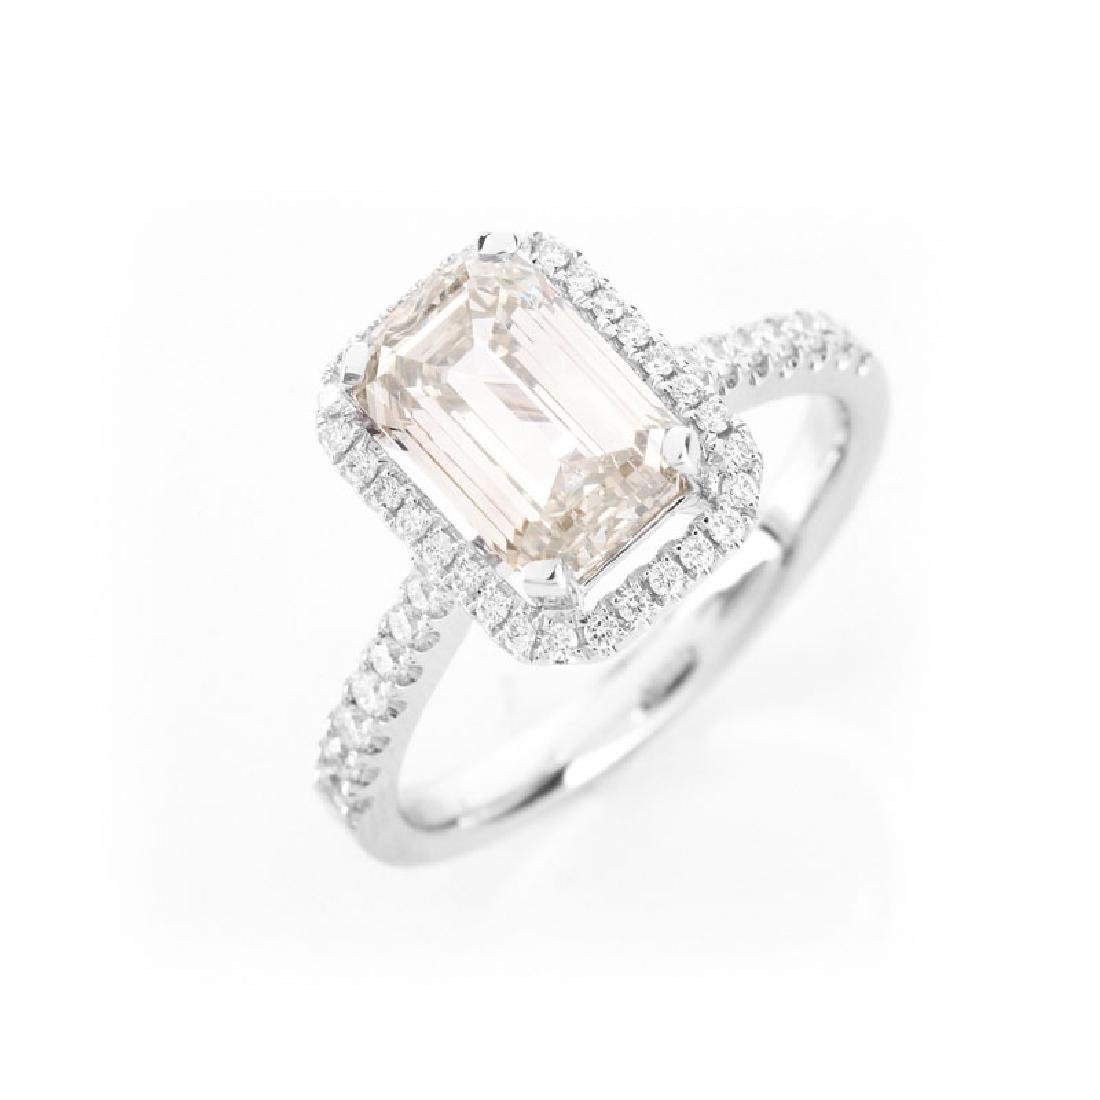 Approx. 2.10 Carat Emerald Cut Diamond and 18 Karat